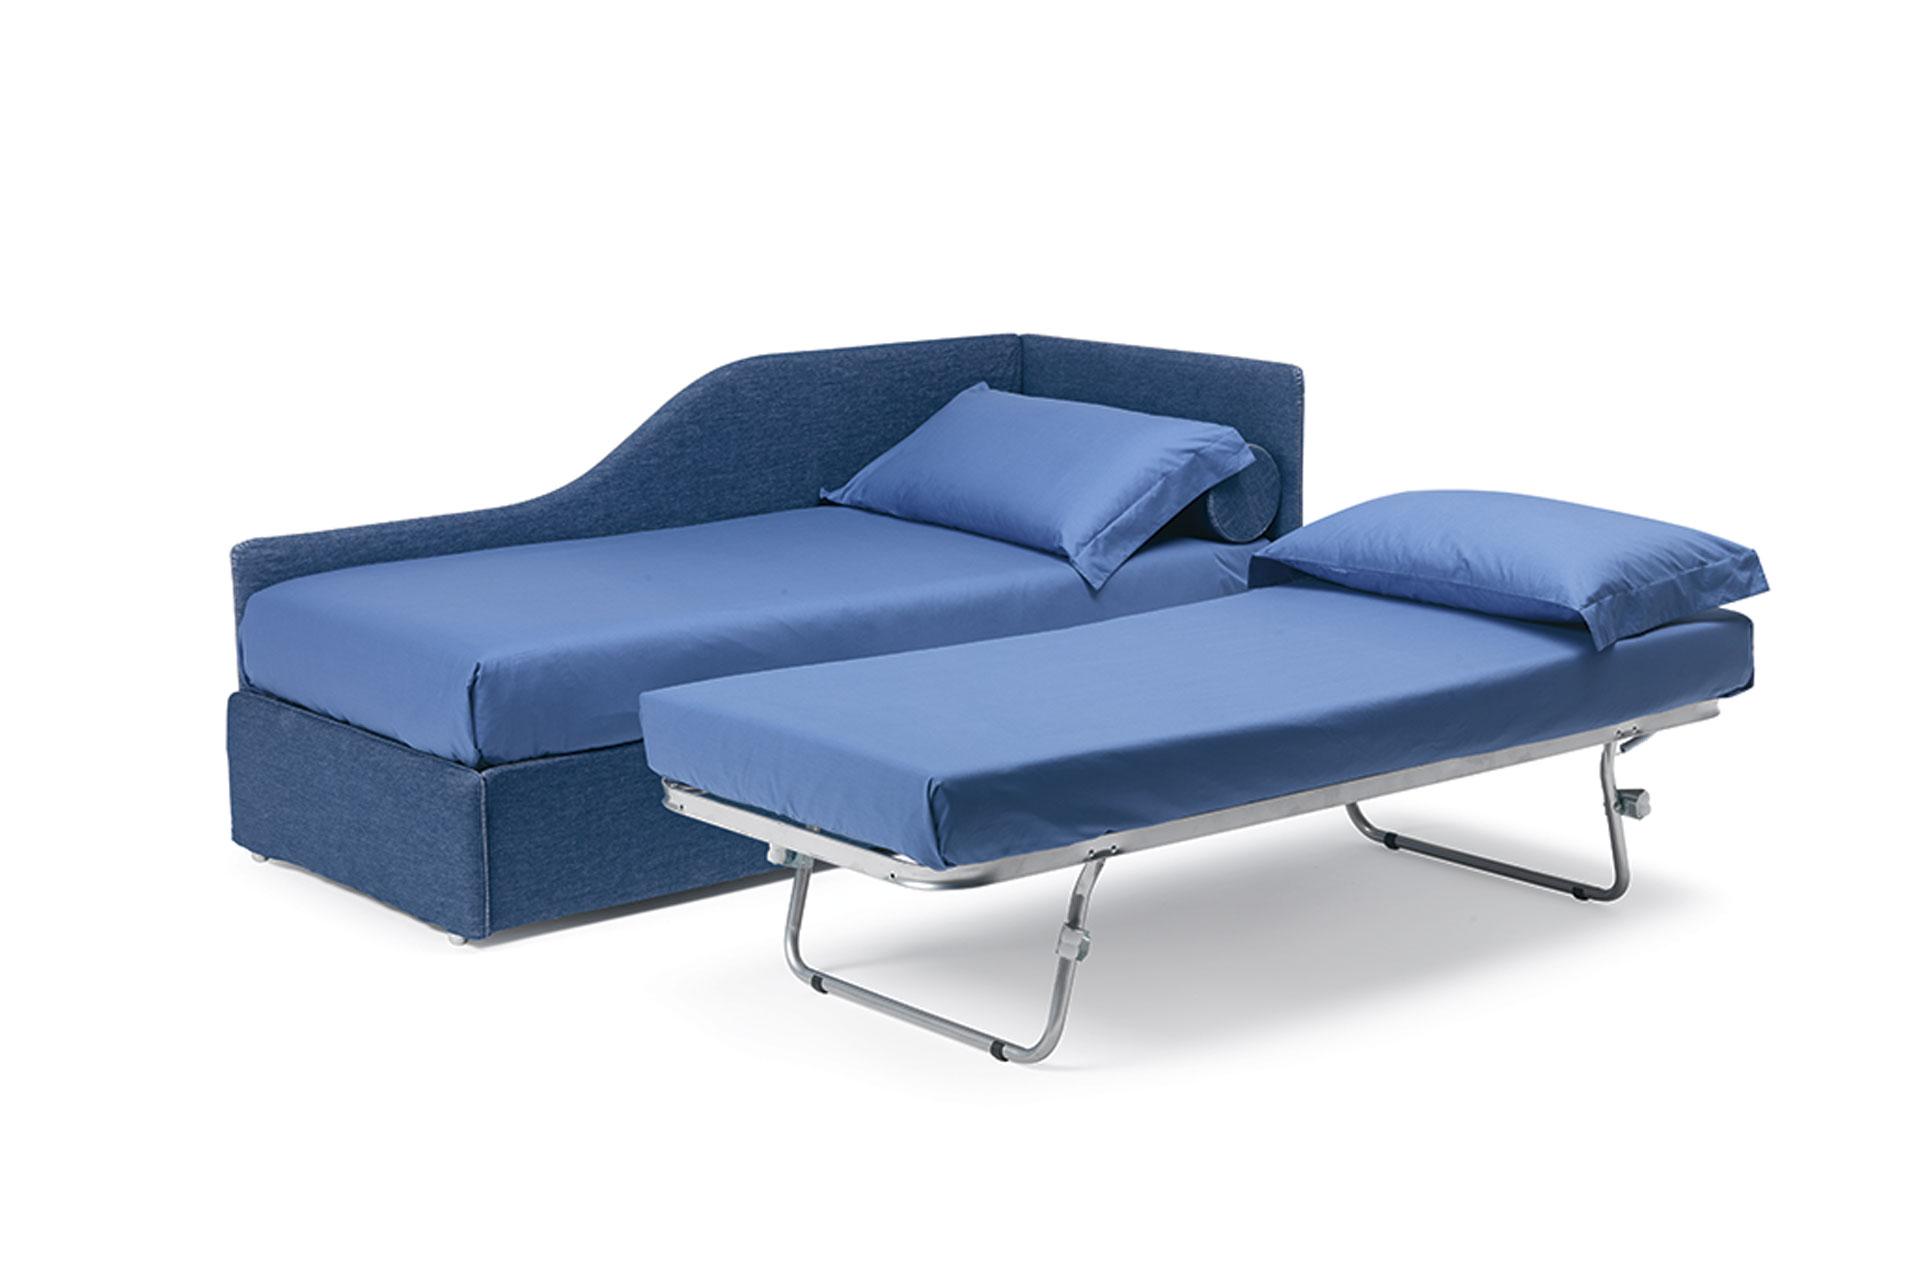 Stunning space v with materassi per divano letto - Materassi per divano letto ...